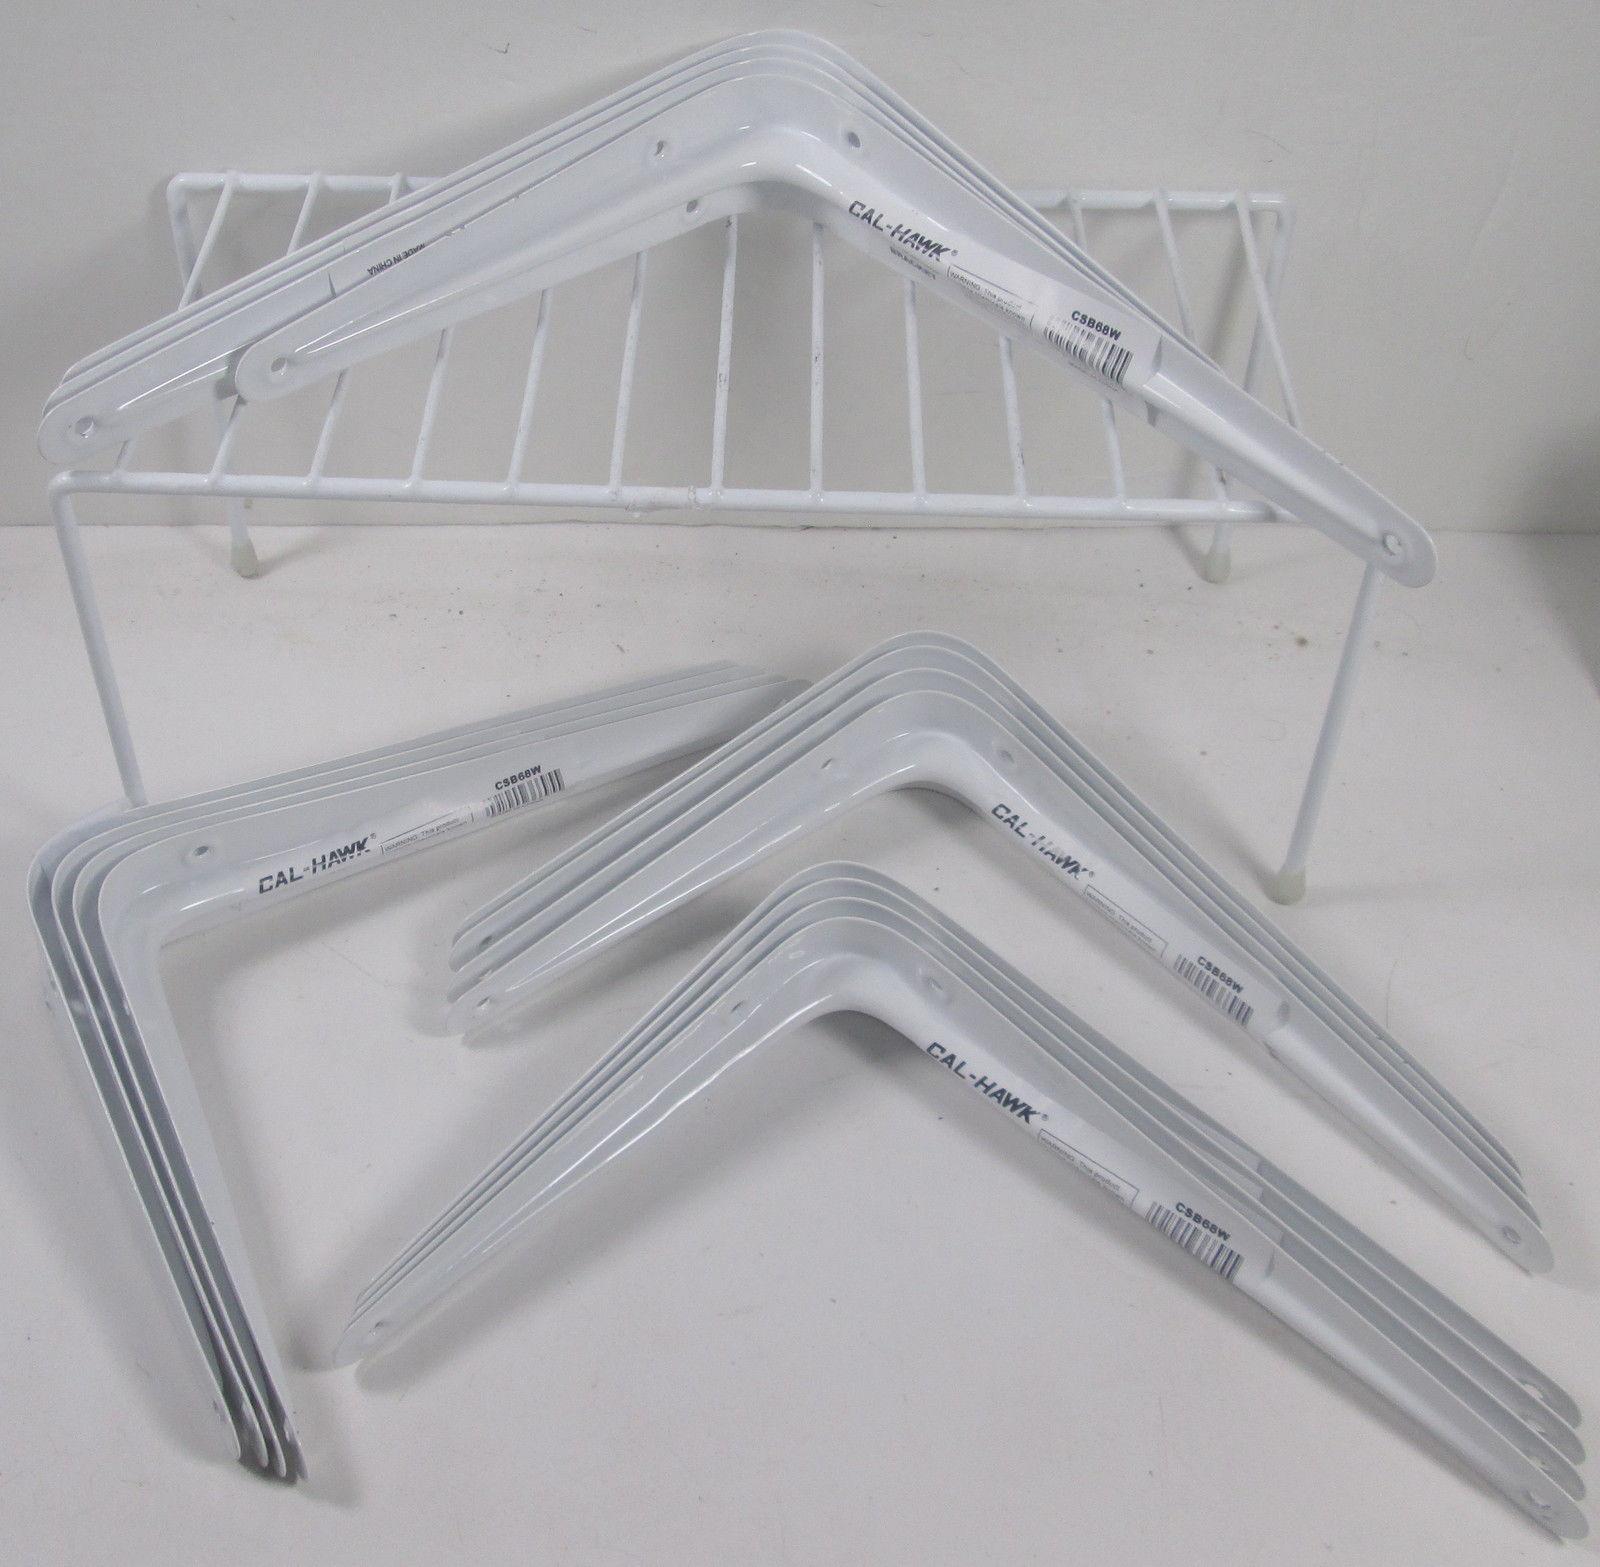 "16 Cal Hawk Tools 4"" x 5"" Shelf Bracket - White"